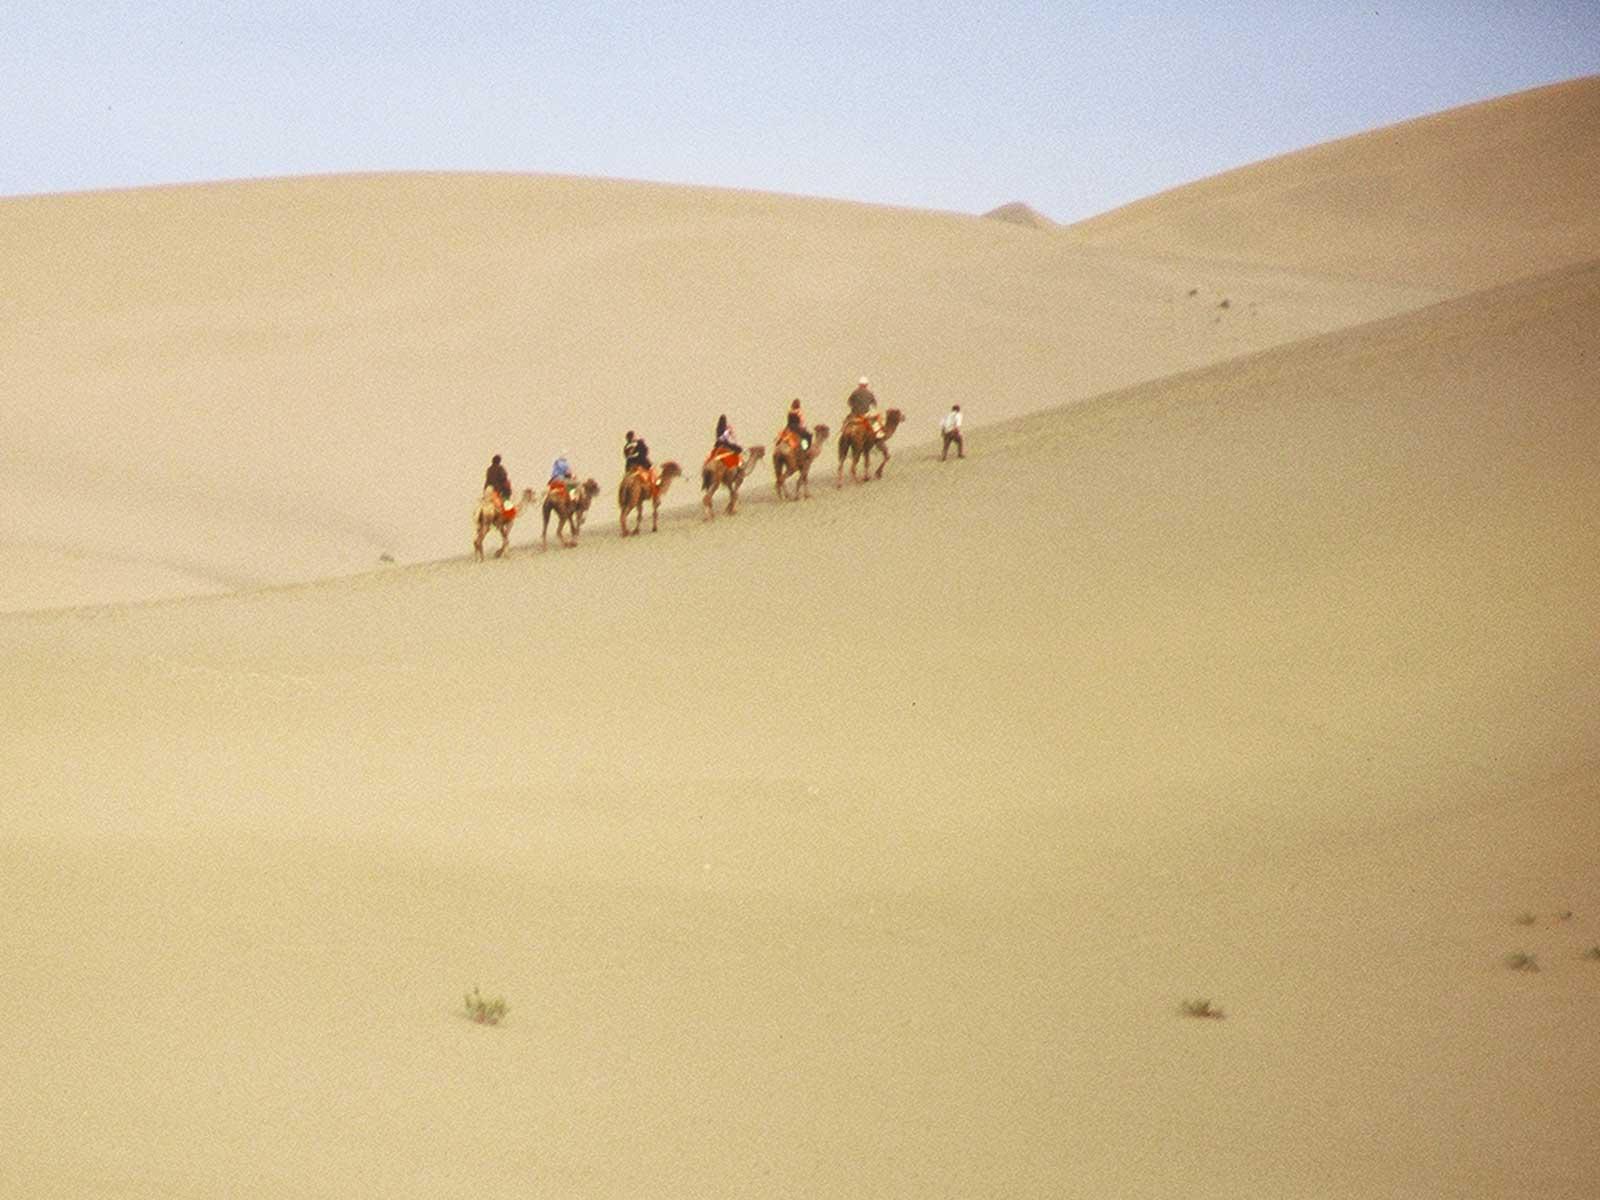 University of Hawaii students at Dunhuang - Singing Sand Dunes - Silk Road Photo Journal - Steven Andrew Martin - Xinjiang China 2001